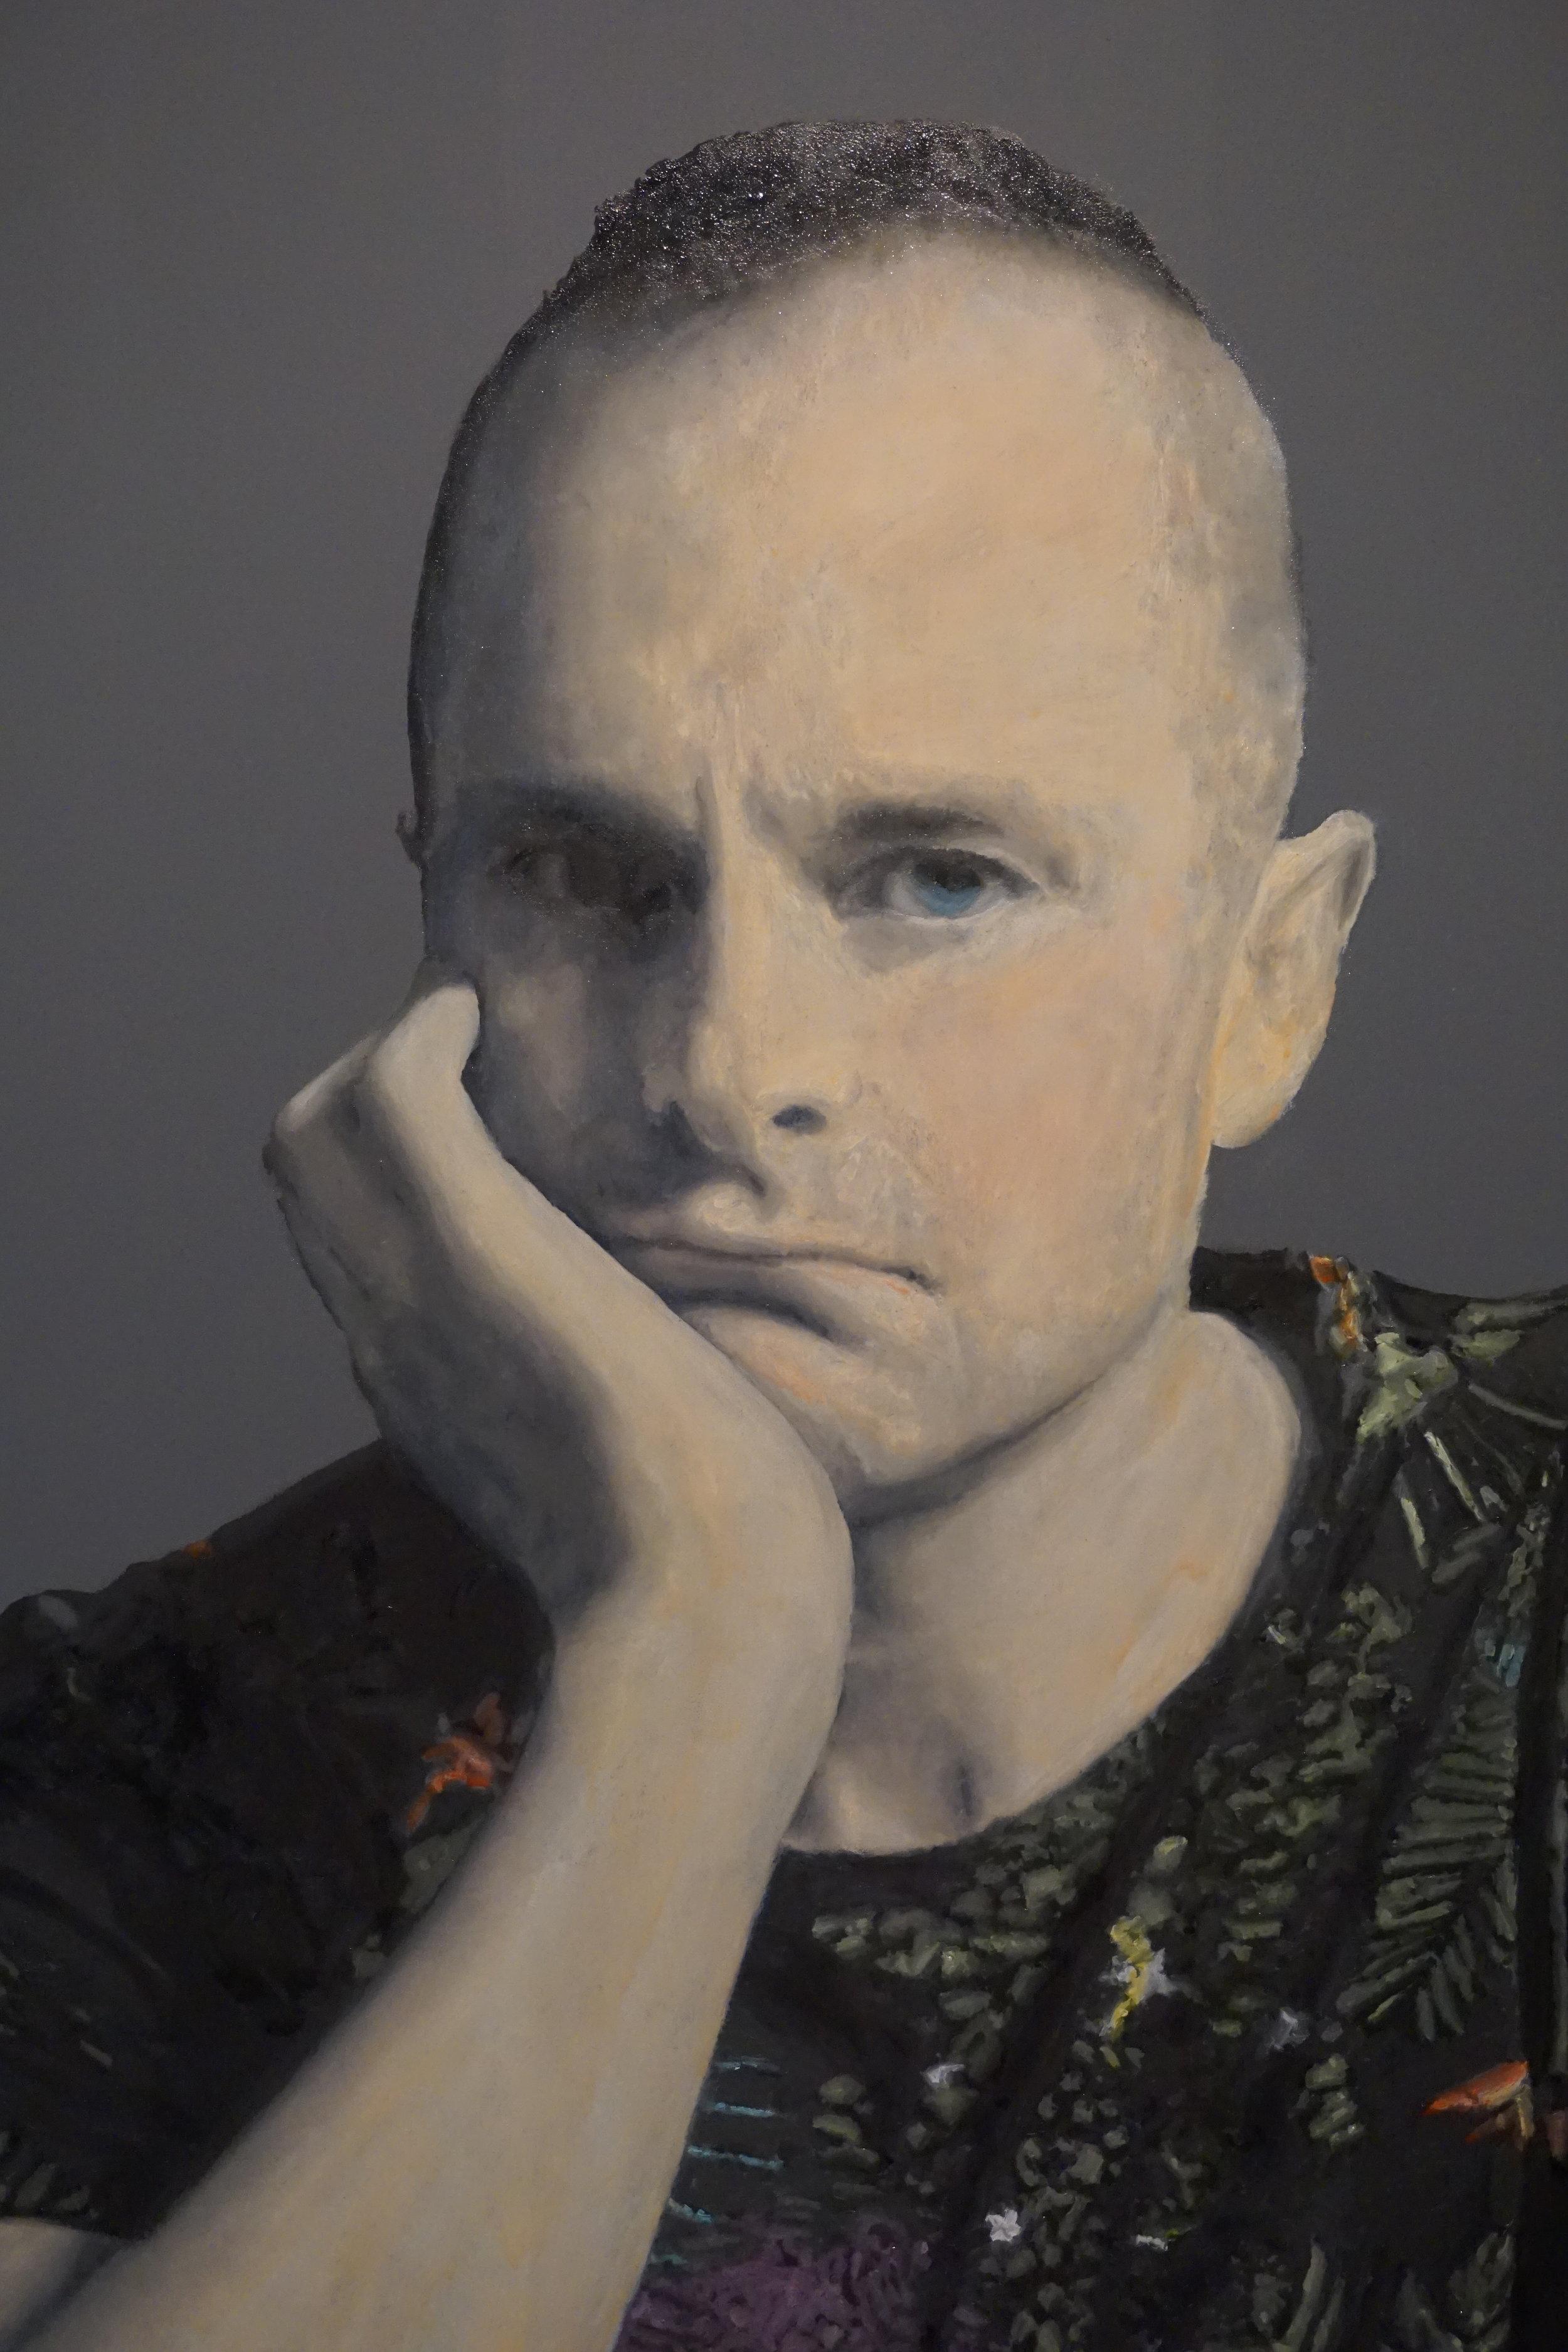 Jesse Waugh Self-portrait